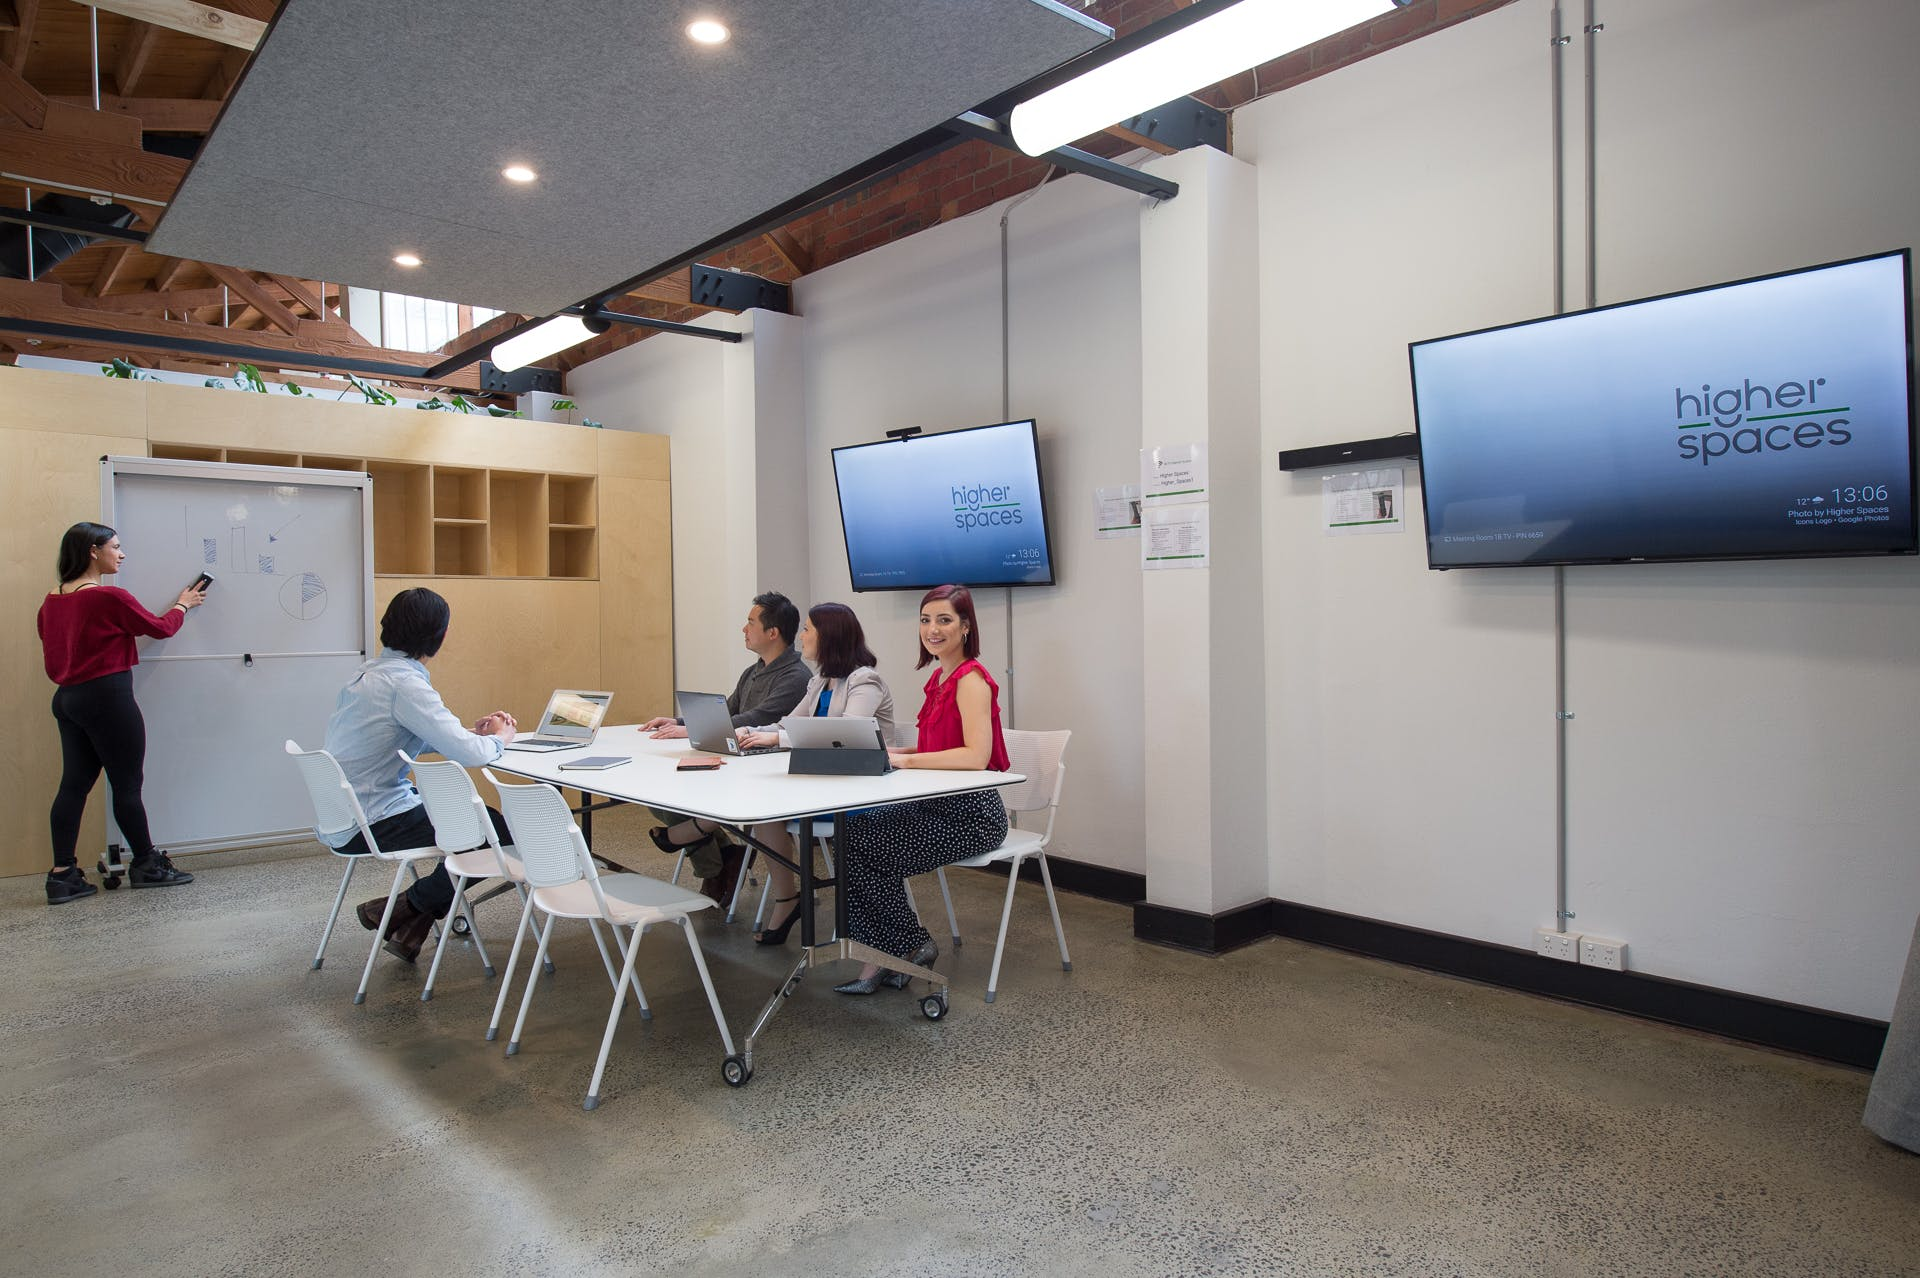 Meeting room 1, meeting room at Higher Spaces, image 1